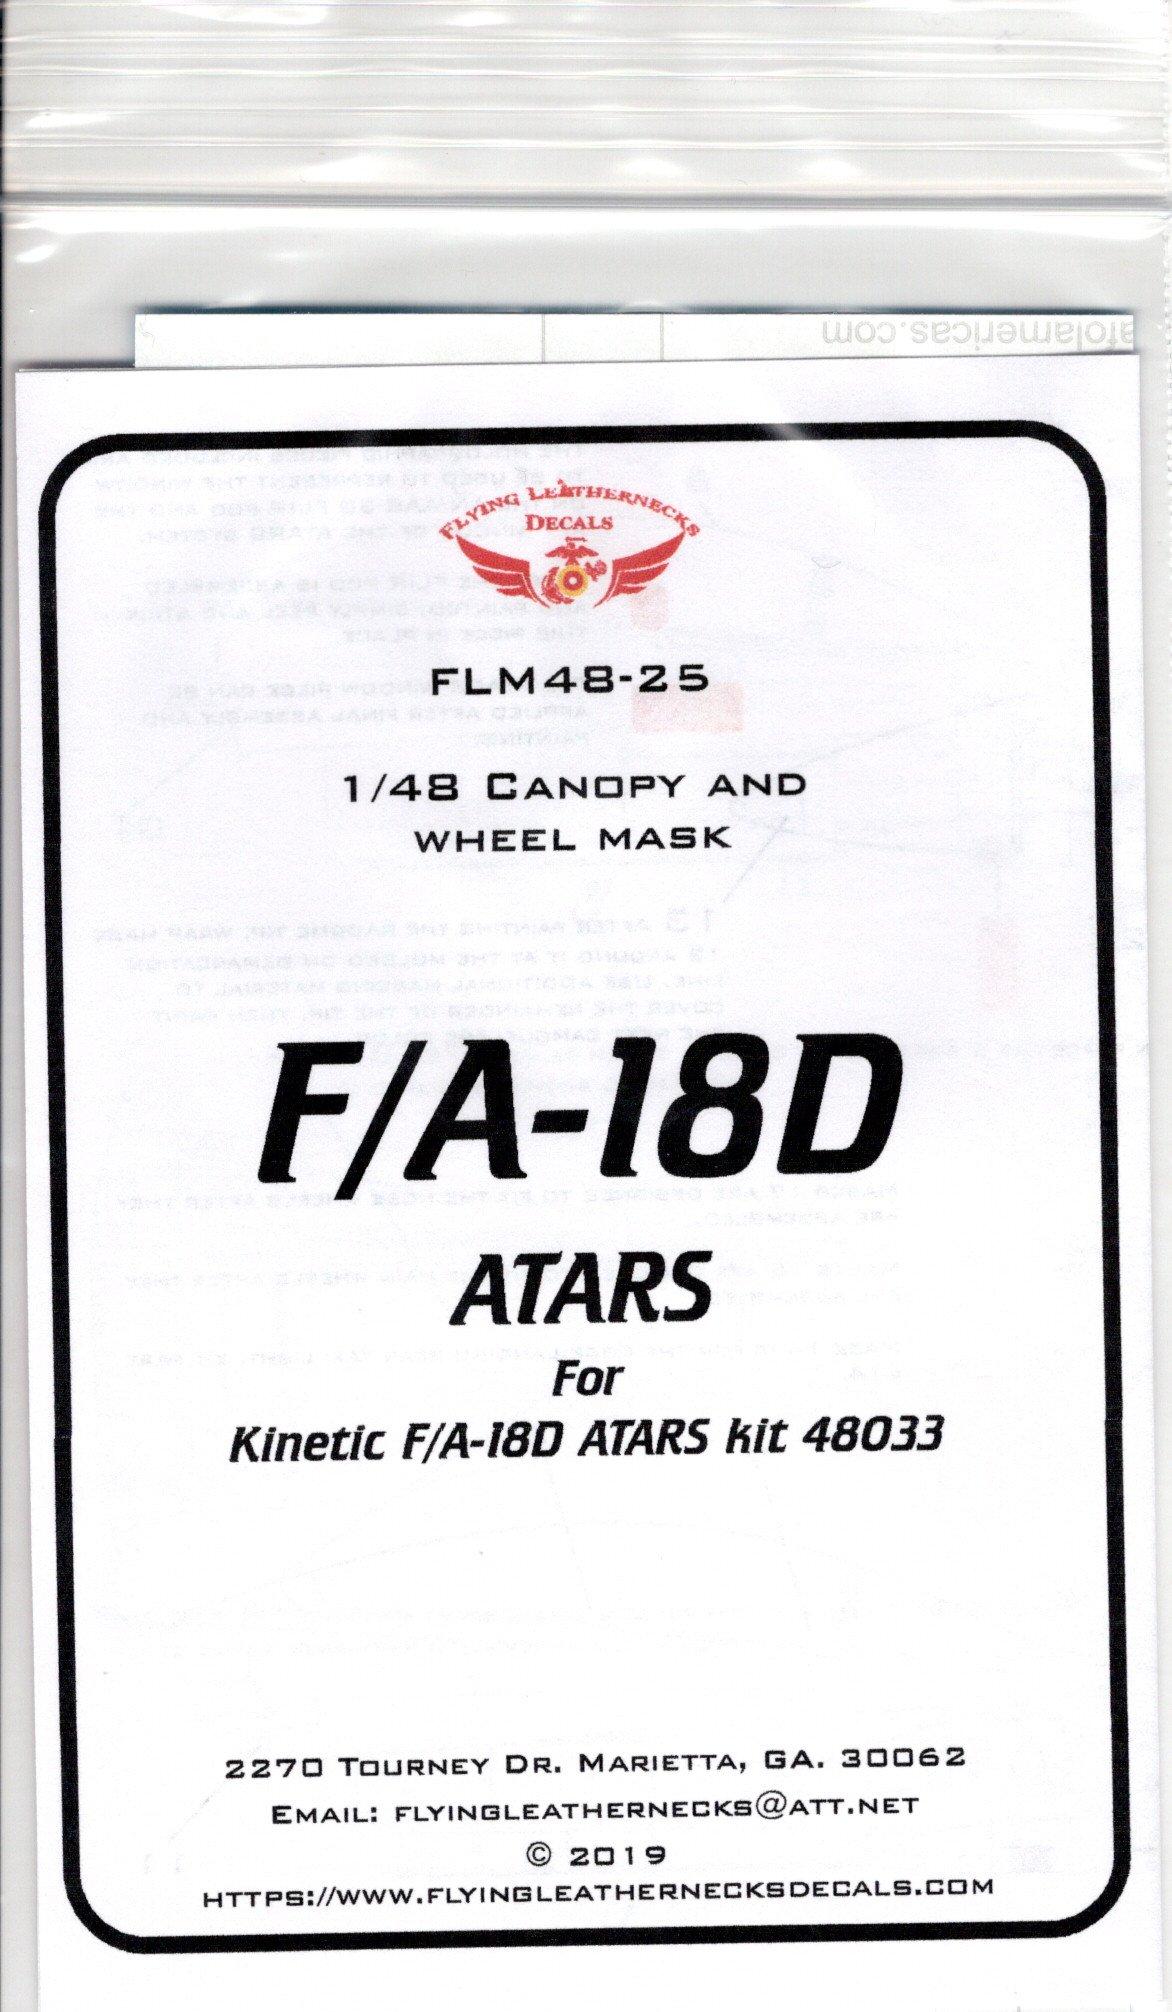 FLM48-25